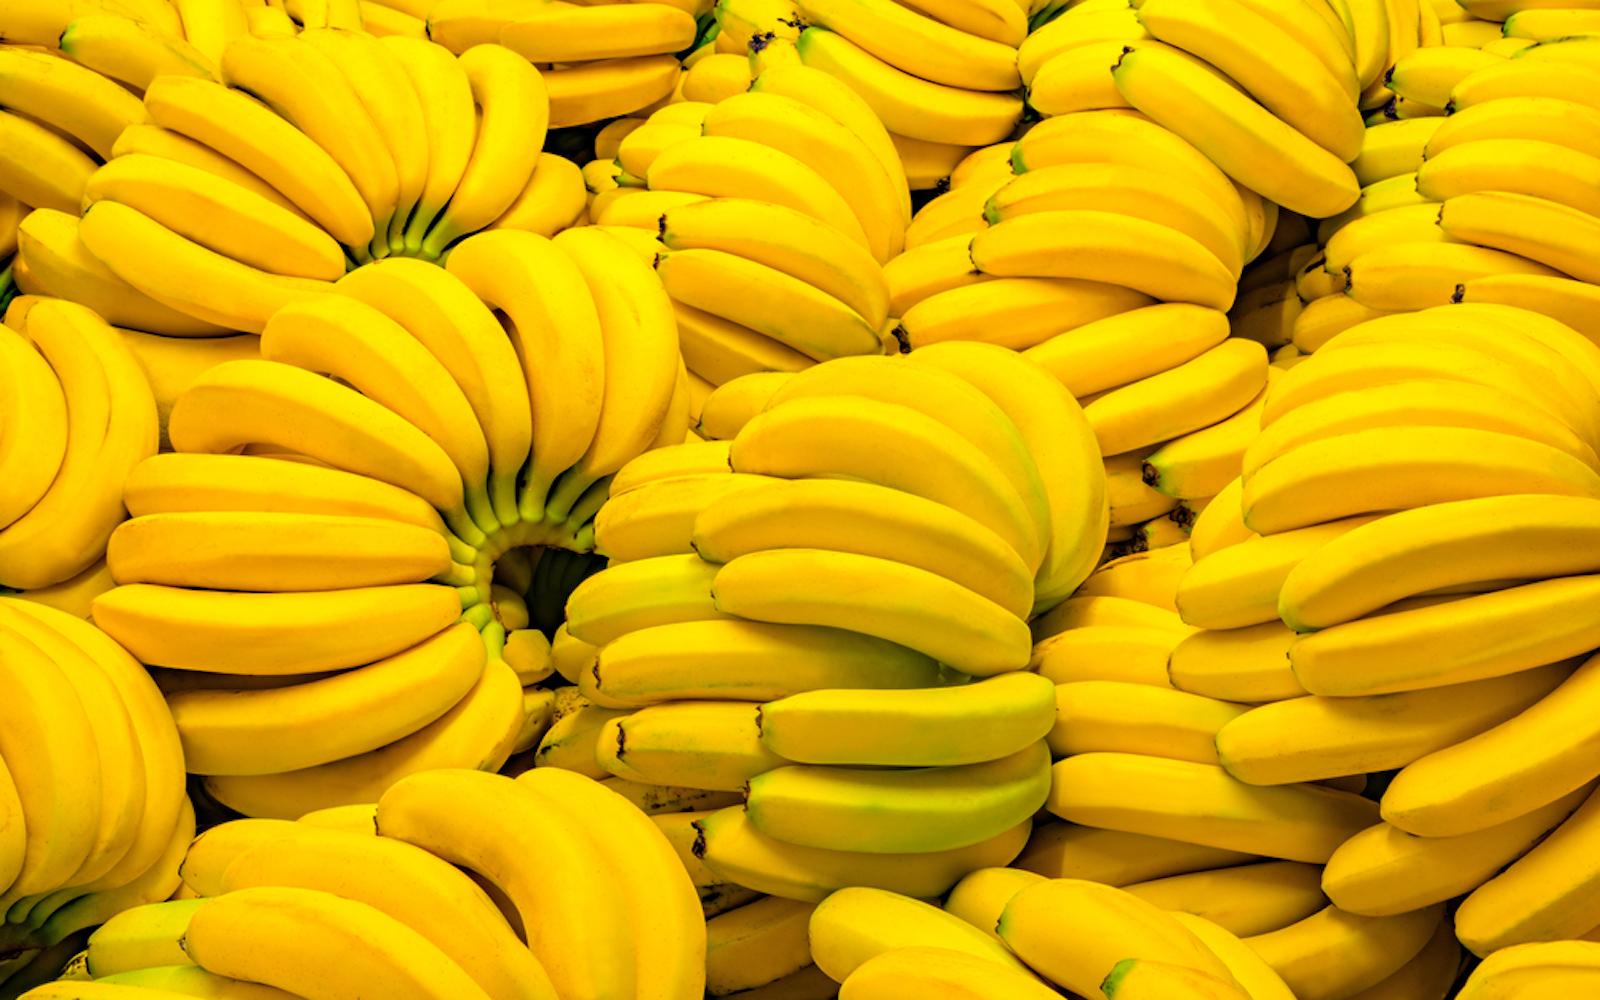 Better-For-You Fruit